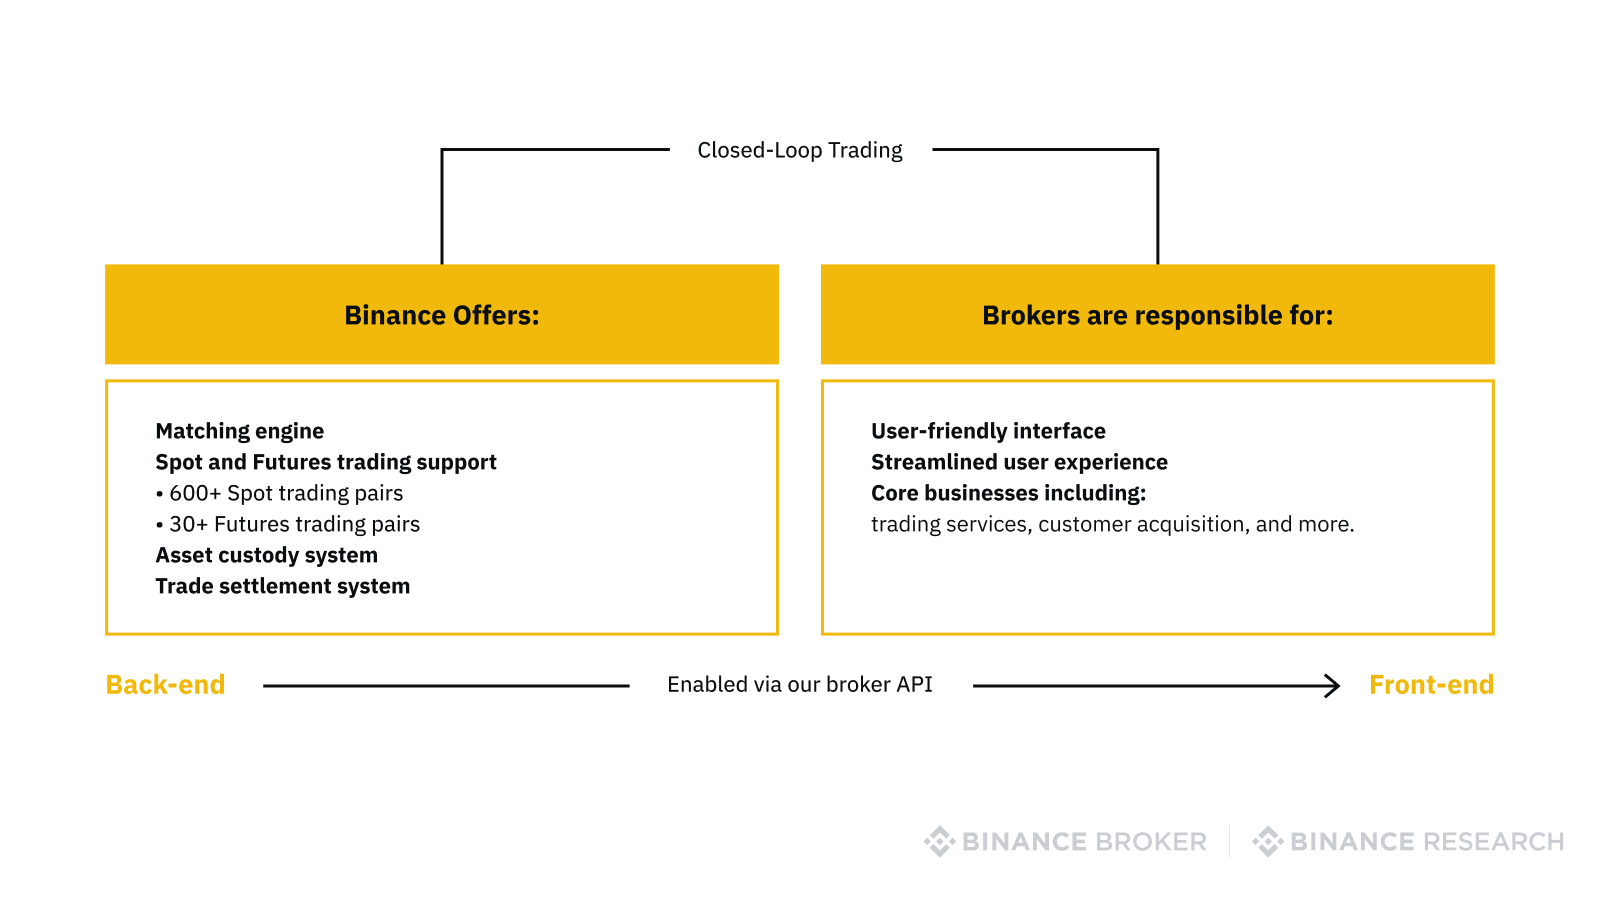 Binance Brokerage as a broker service provider